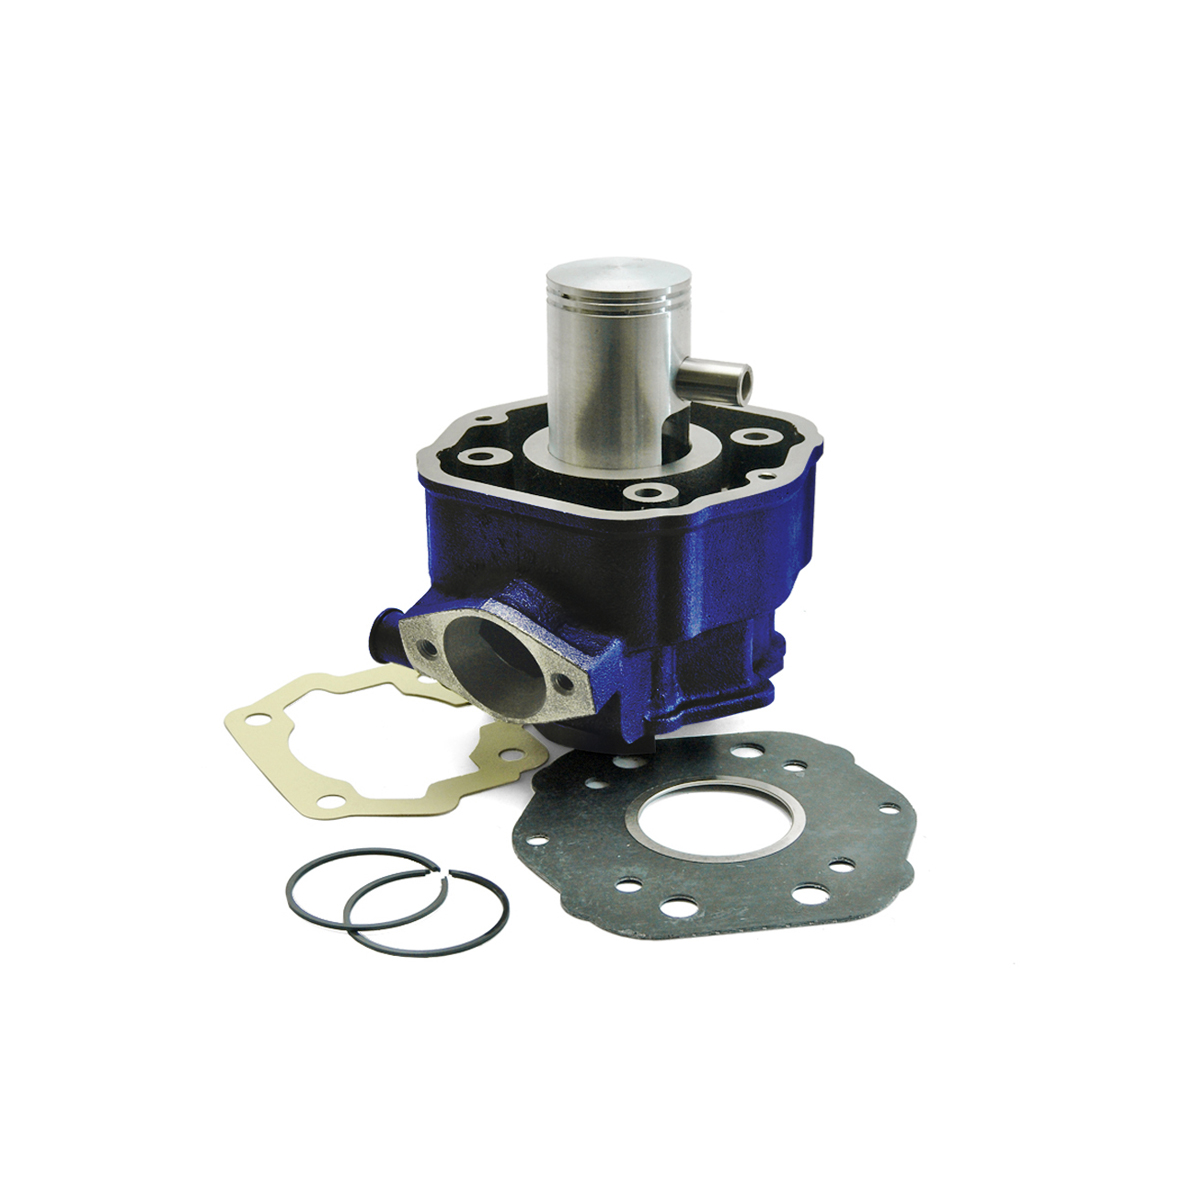 Cylindre Carenzi D.40 Fonte Derbi Euro 2 Bleu 50cc